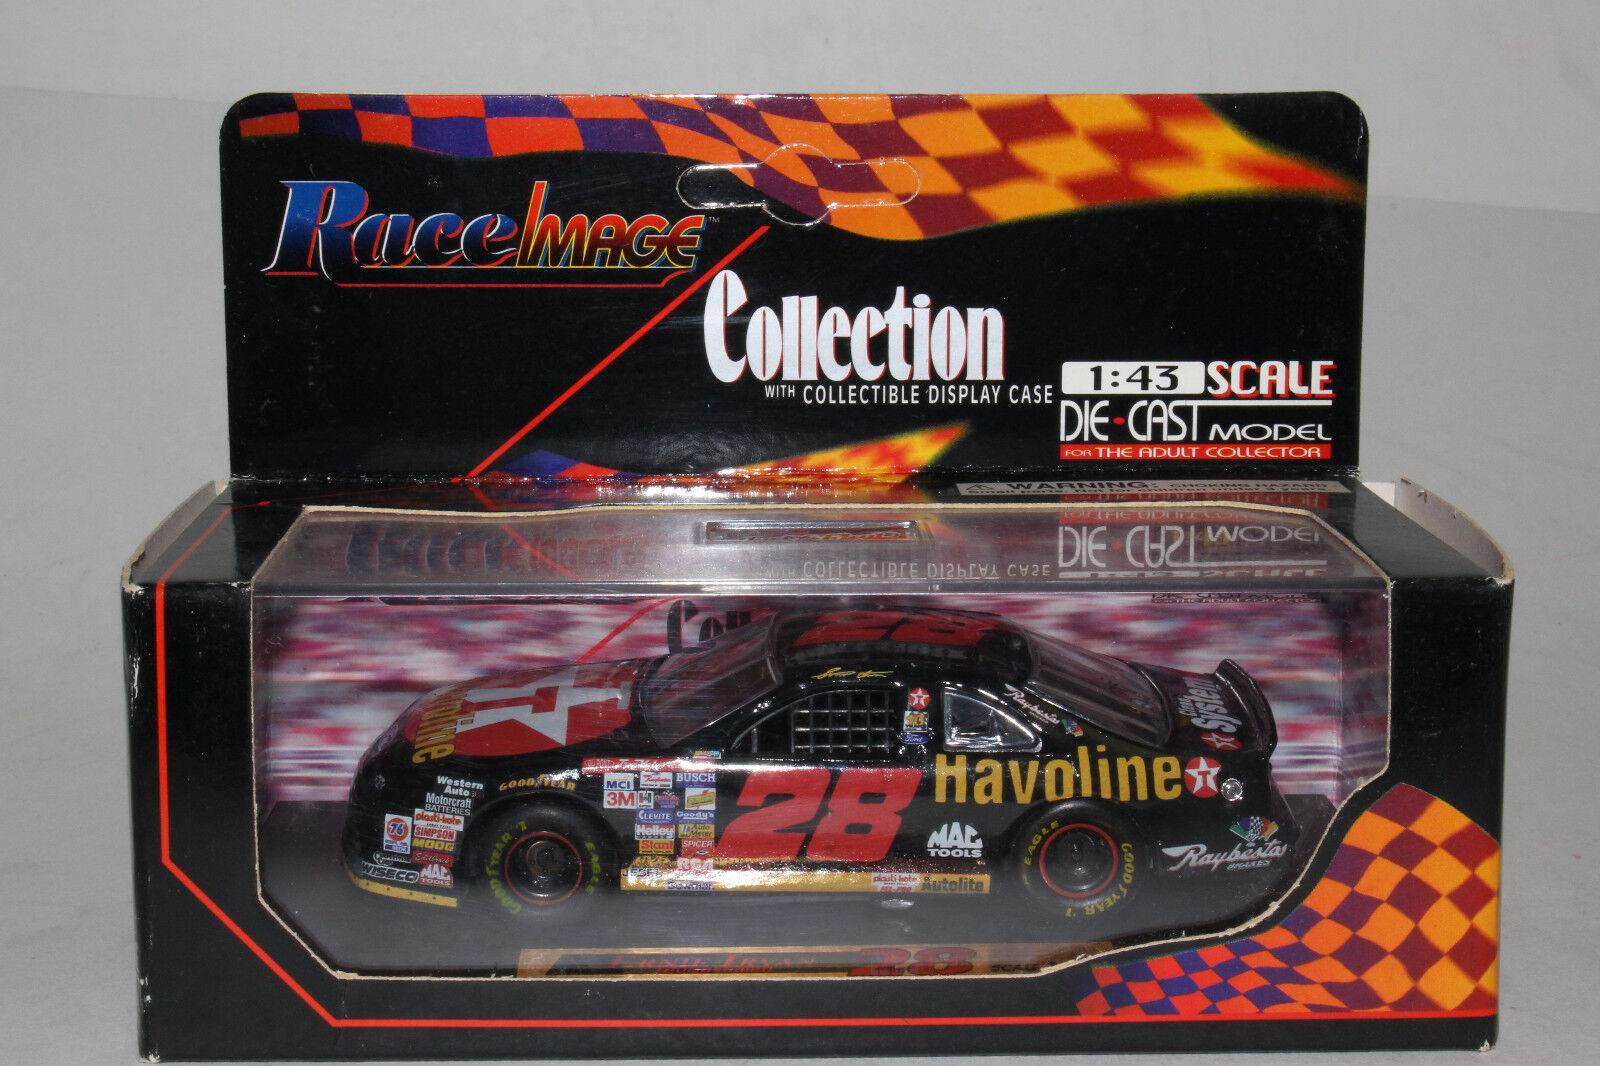 RACE IMAGE DIECAST NASCAR ERNIE ERNIE ERNIE IRVAN TEXACO HAVOLINE FORD, 1 43, NEW IN BOX 38d560